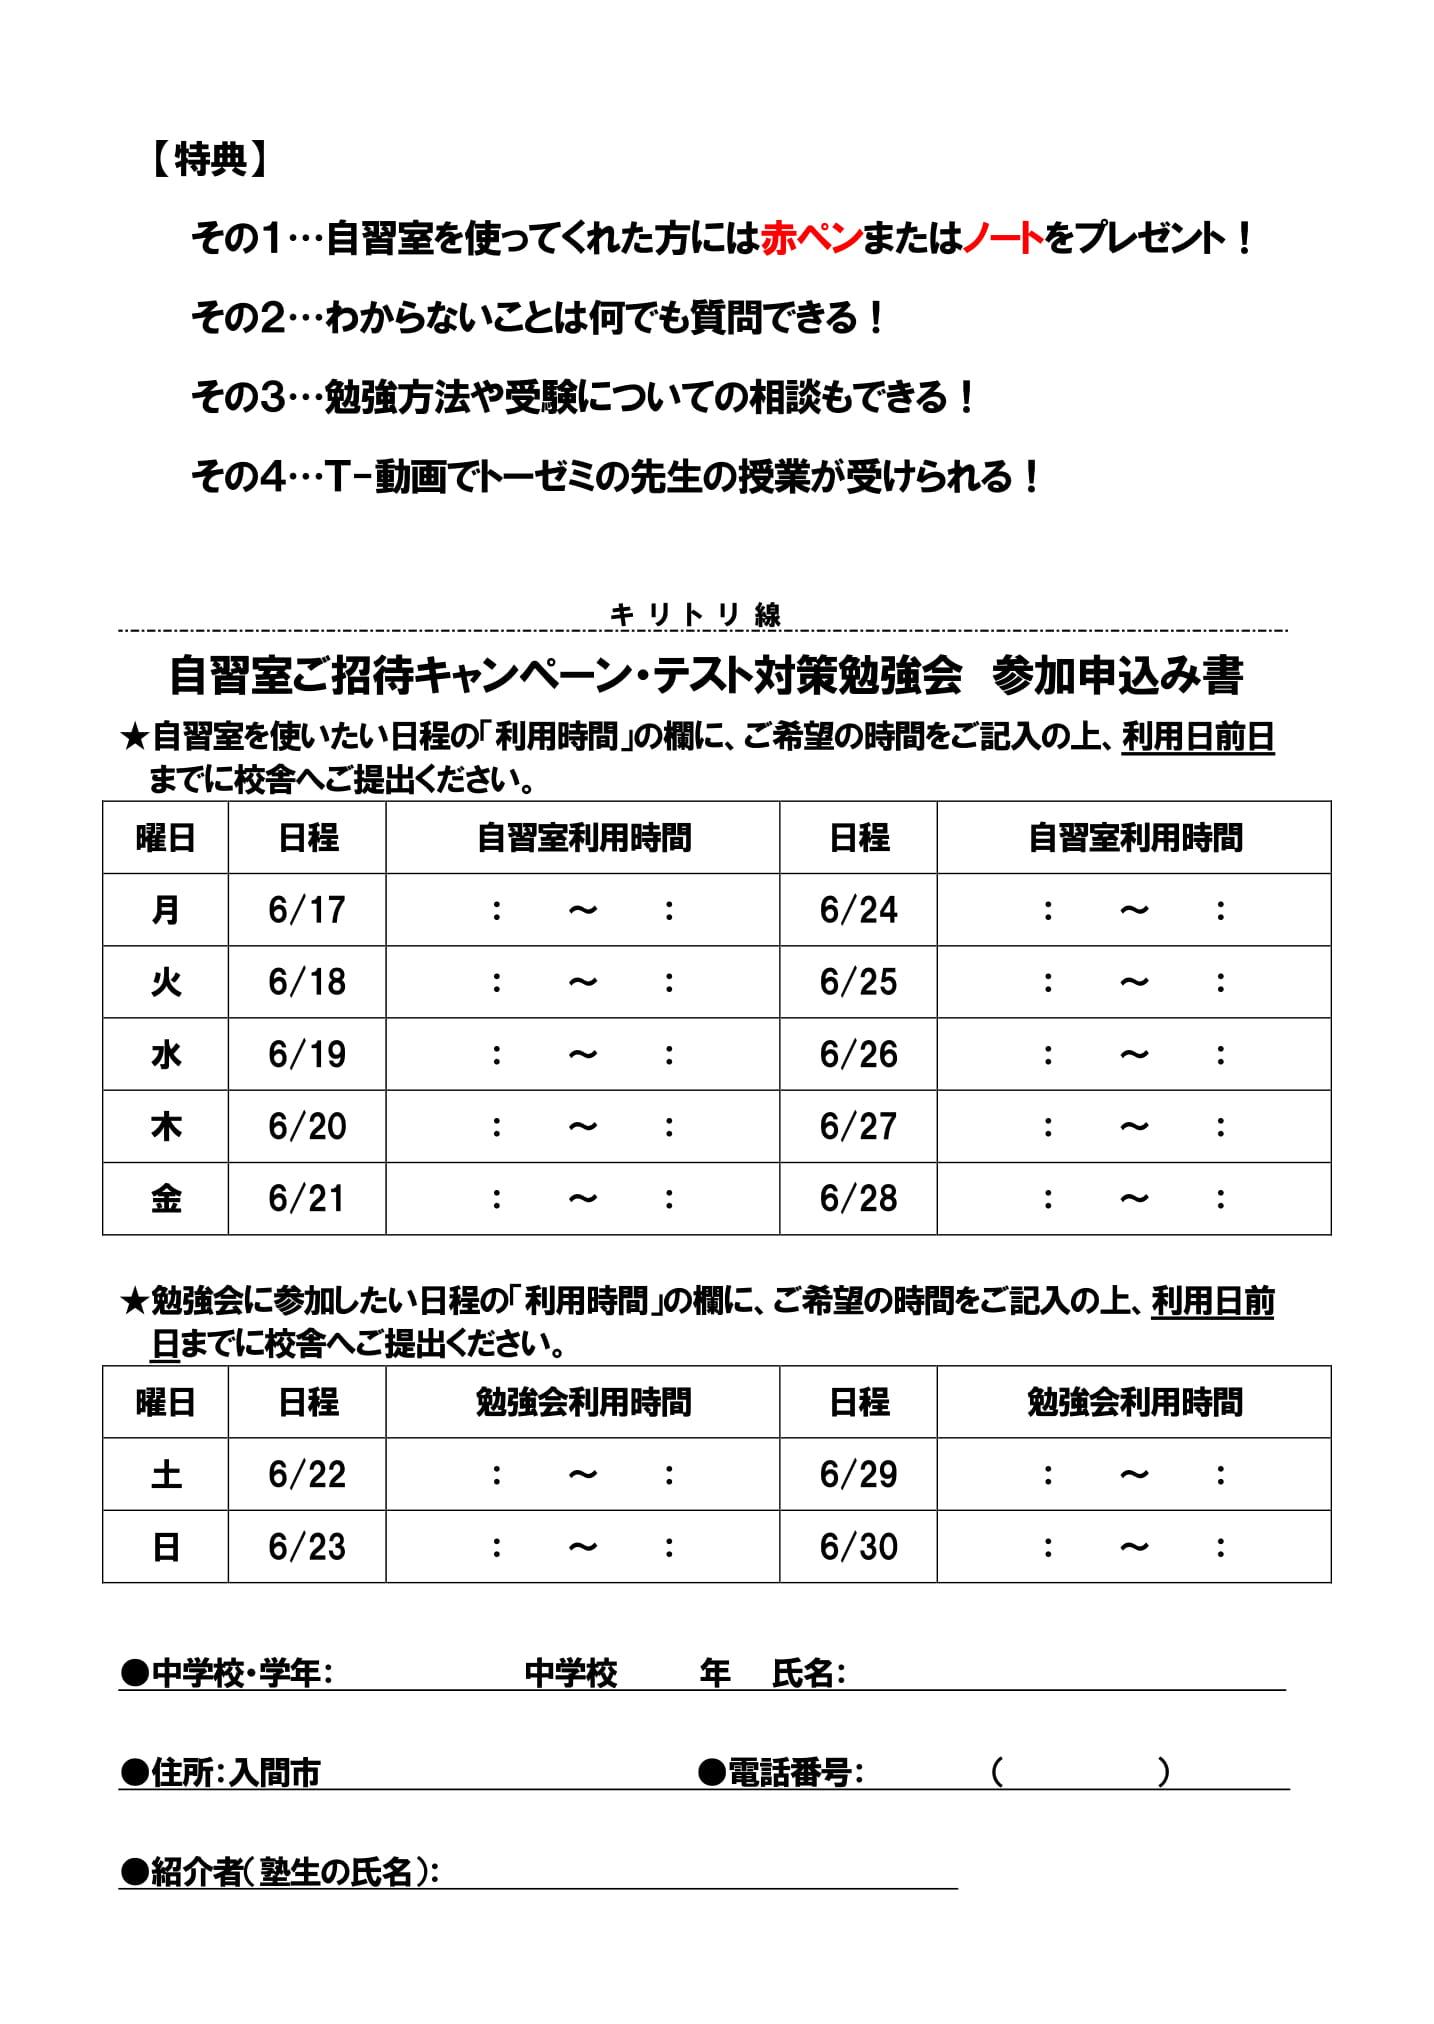 1906%e5%ae%9a%e6%9c%9f%e3%83%86%e3%82%b9%e3%83%88%e5%8b%89%e5%bc%b7%e4%bc%9a%e6%a1%88%e5%86%85%e3%83%ac%e3%82%bf%e3%83%bc%e4%b8%80%e5%ad%a6%e6%9c%9f%e6%9c%9f%e6%9c%ab-%ef%bc%88%e4%b8%80%e8%88%ac